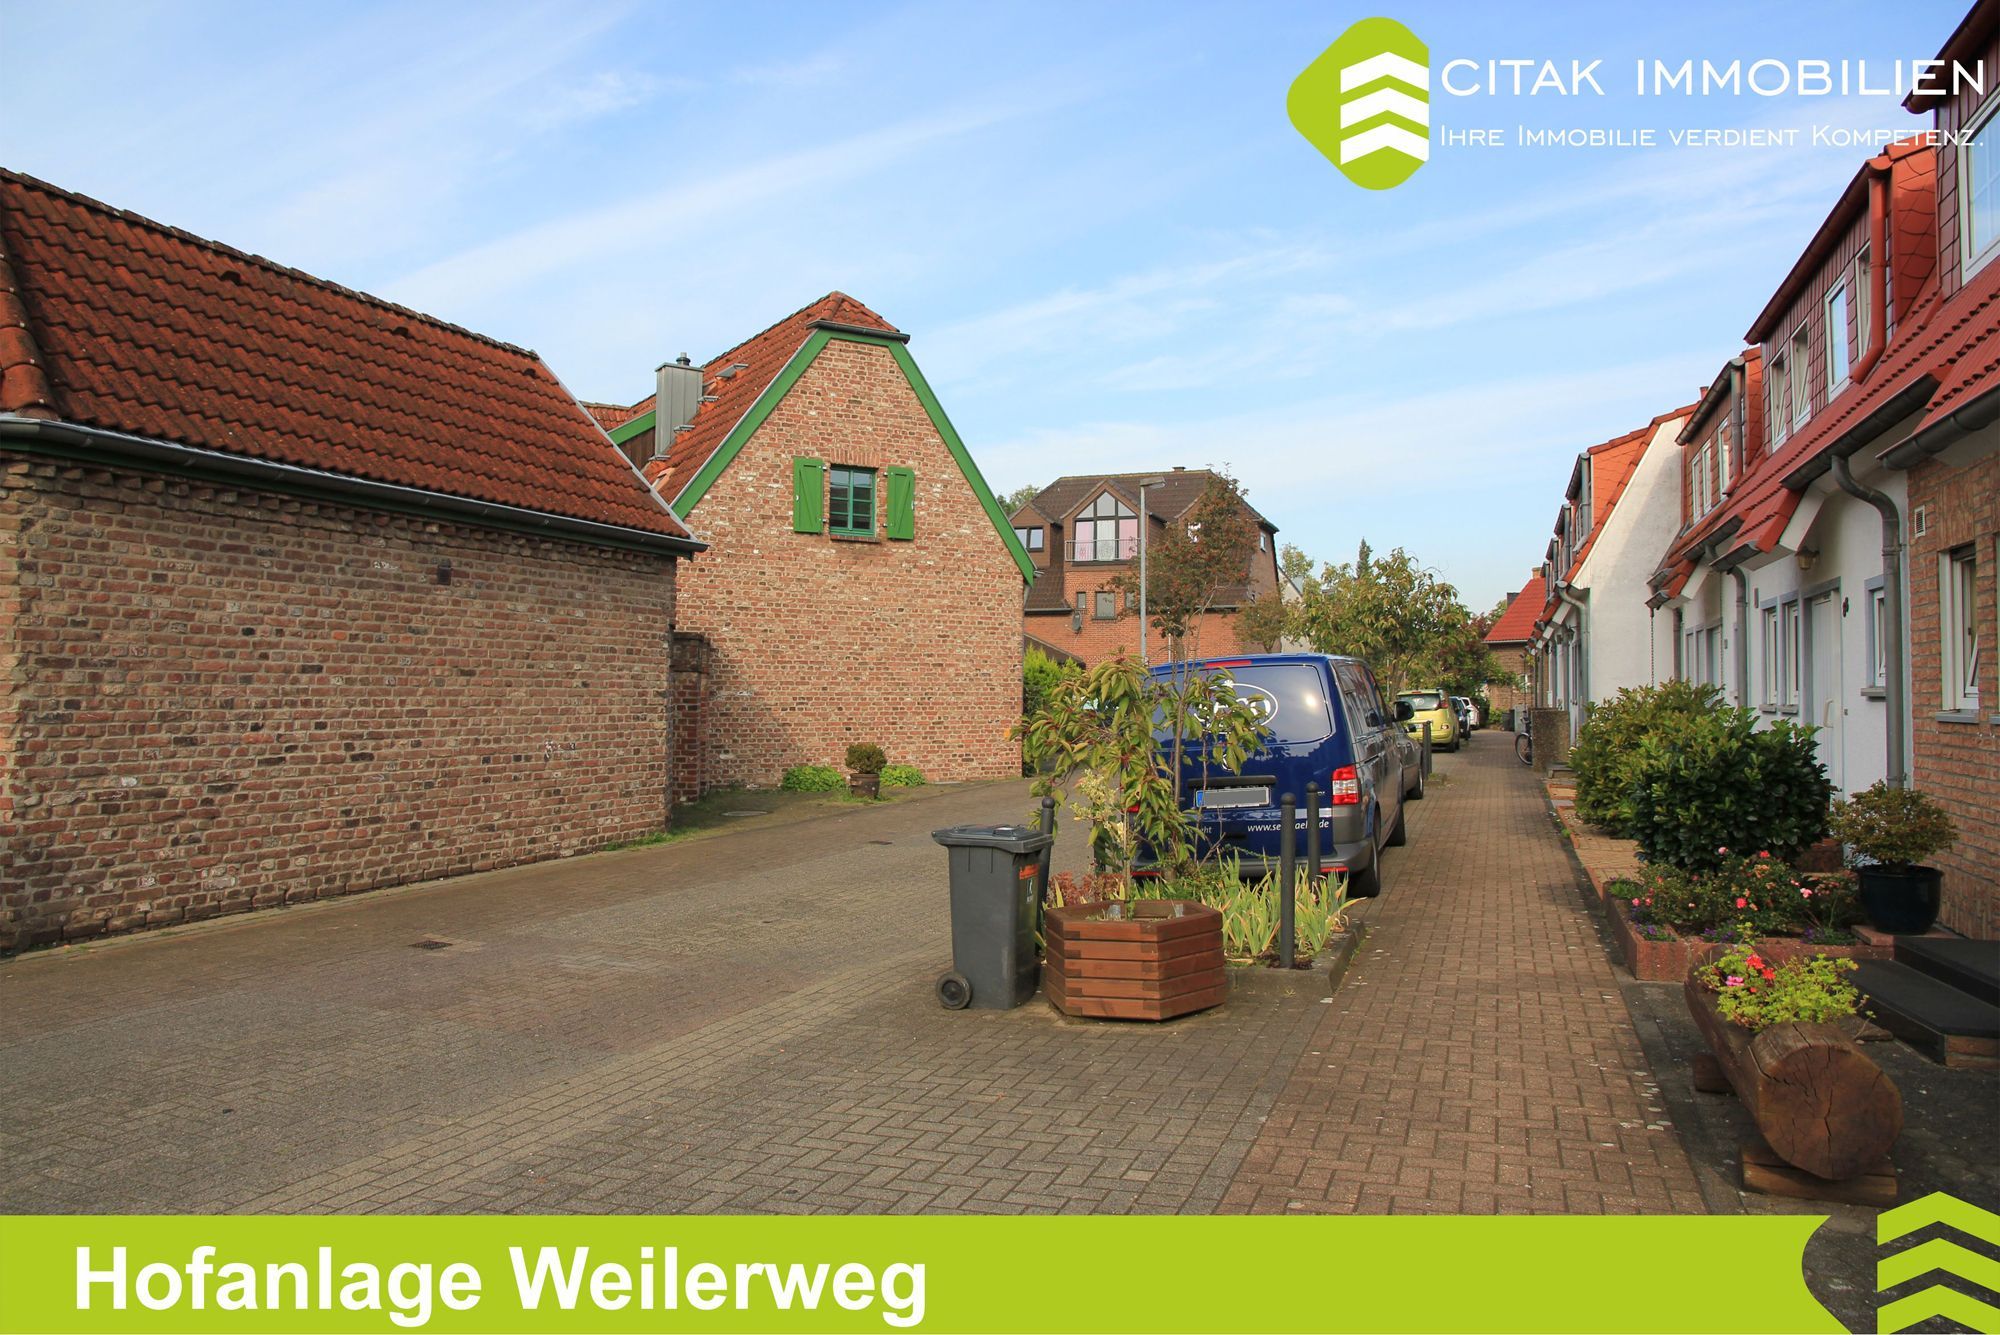 Koln Volkhoven Weiler Hofanlage Weiler Weg Hofanlage Immobilien Immobilienmakler